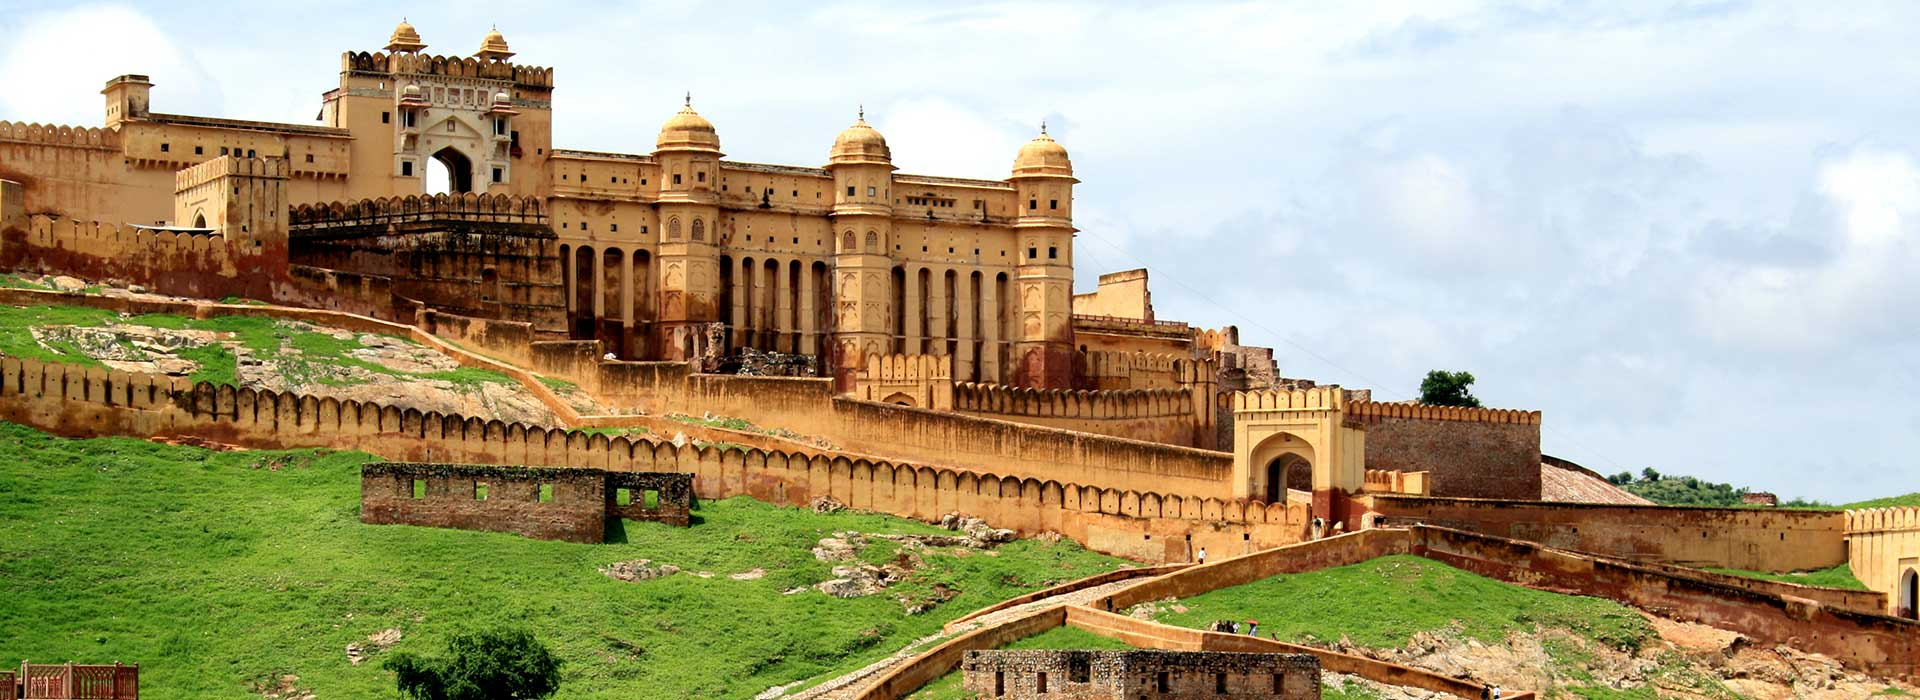 Jaipur Jodhpur Tour Package From Delhi - Journeydeal ... Nahargarh Fort At Night